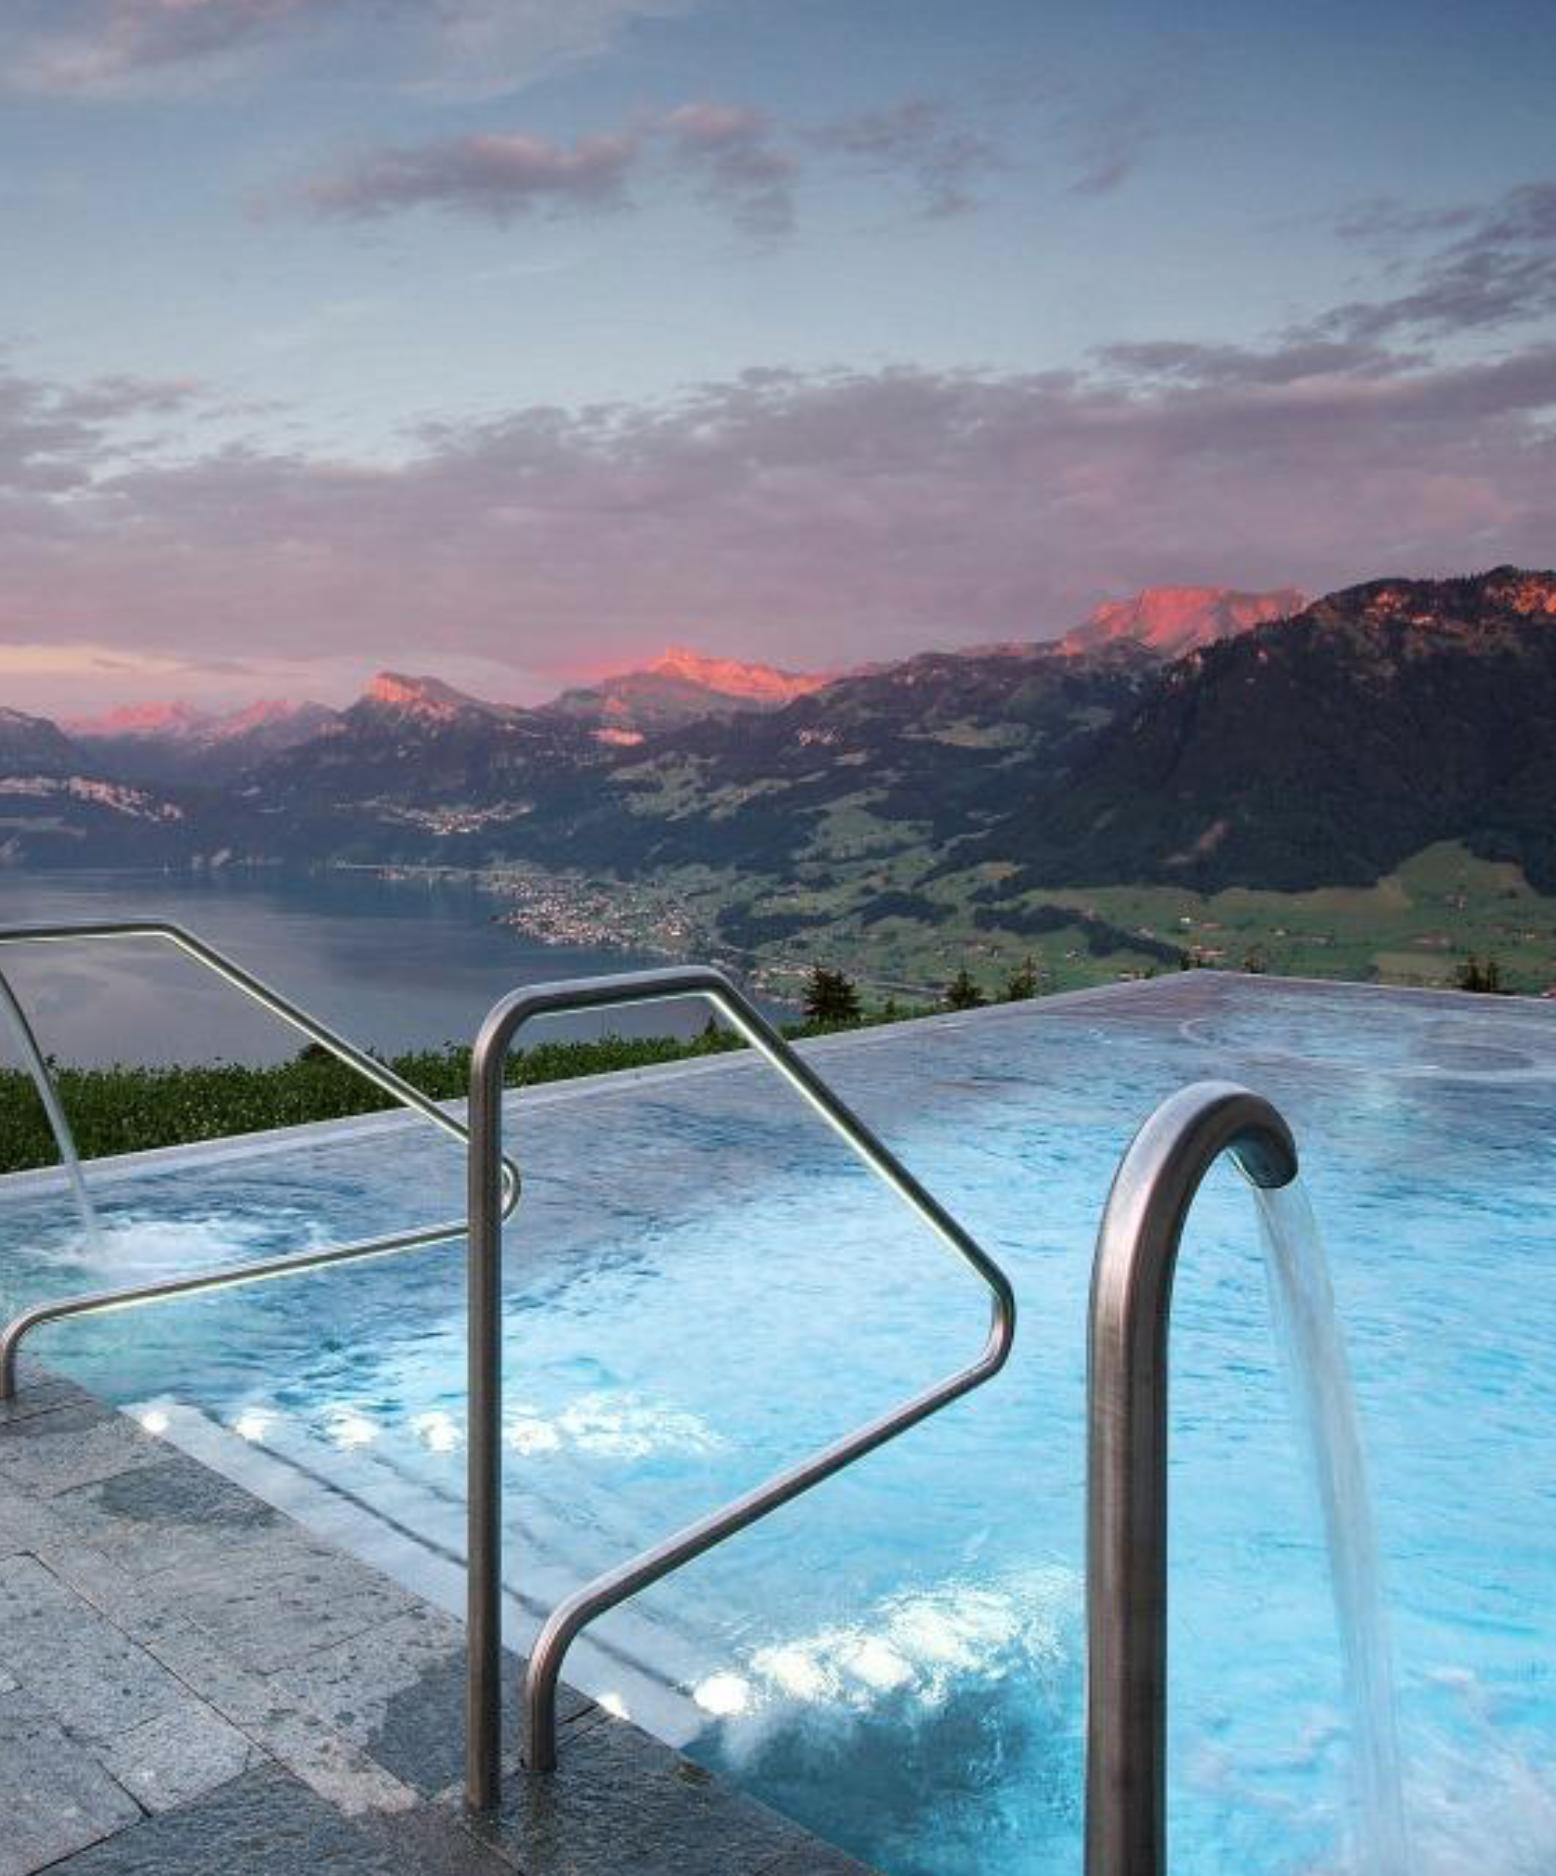 Best Hotel In Switzerland With Infinity Pool Hotel Villa Honegg Switzerland 914 Metres Above Sea Level The Hotel Villa Honegg S Infinity Pool Has Views Hotel Villa Honegg Villa Honegg Switzerland Hotels